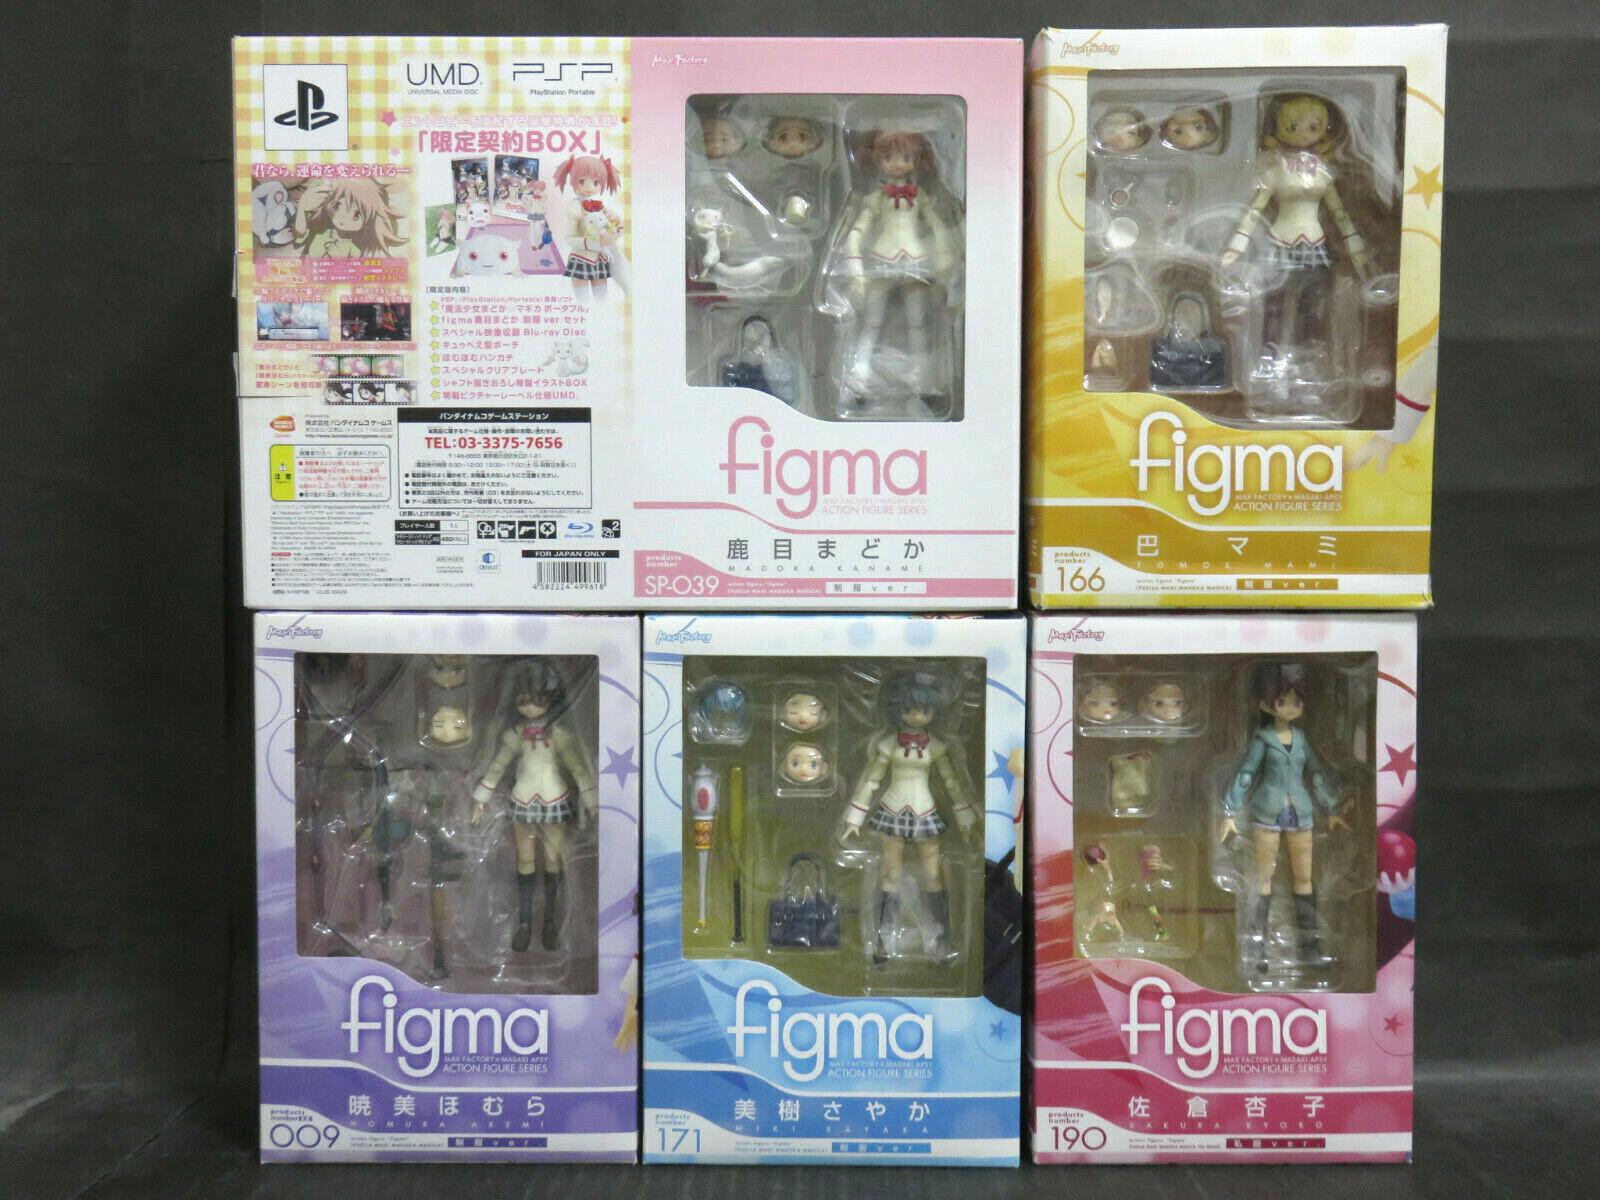 Figma Puella Magi Madoka Magica Uniforme Ver. 5 figuras (Mami Sayaka..) Set